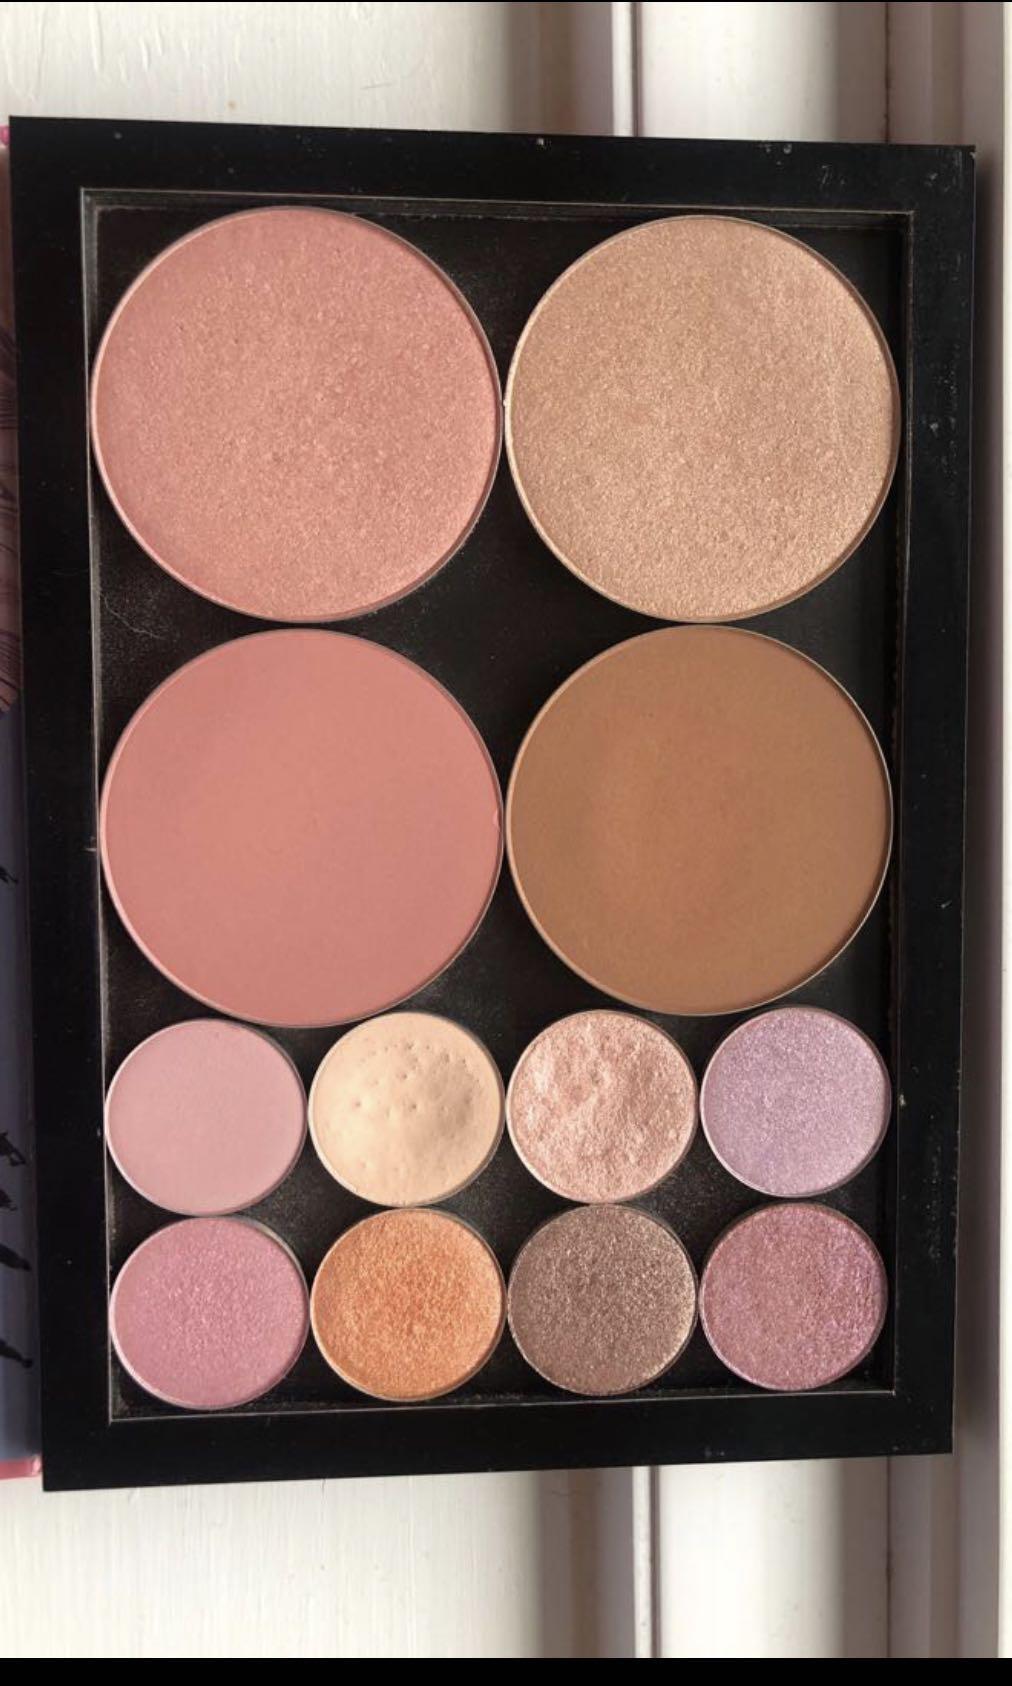 Makeup Lot Jeffree Star, Colourpop, Too Faced, Morphe.